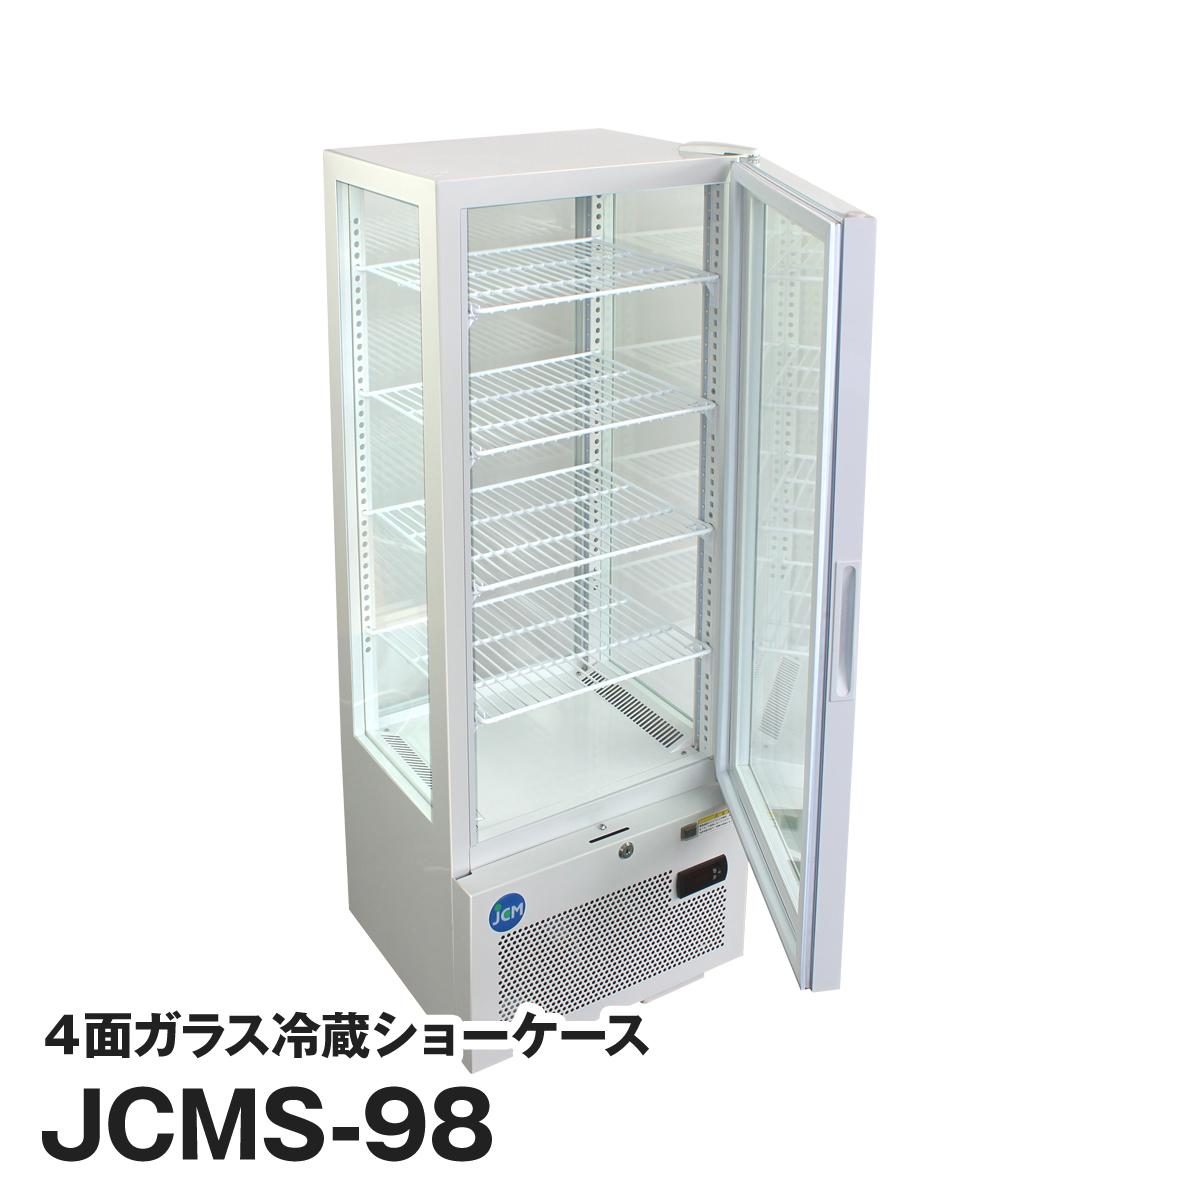 JCM社製 新品 業務用 保冷庫 冷蔵庫 冷蔵庫 98L 4面 ガラス 冷蔵ショーケース JCMS-98 ガラス 新品, チャイルドブティックくれよん:0b2e1f7a --- officewill.xsrv.jp